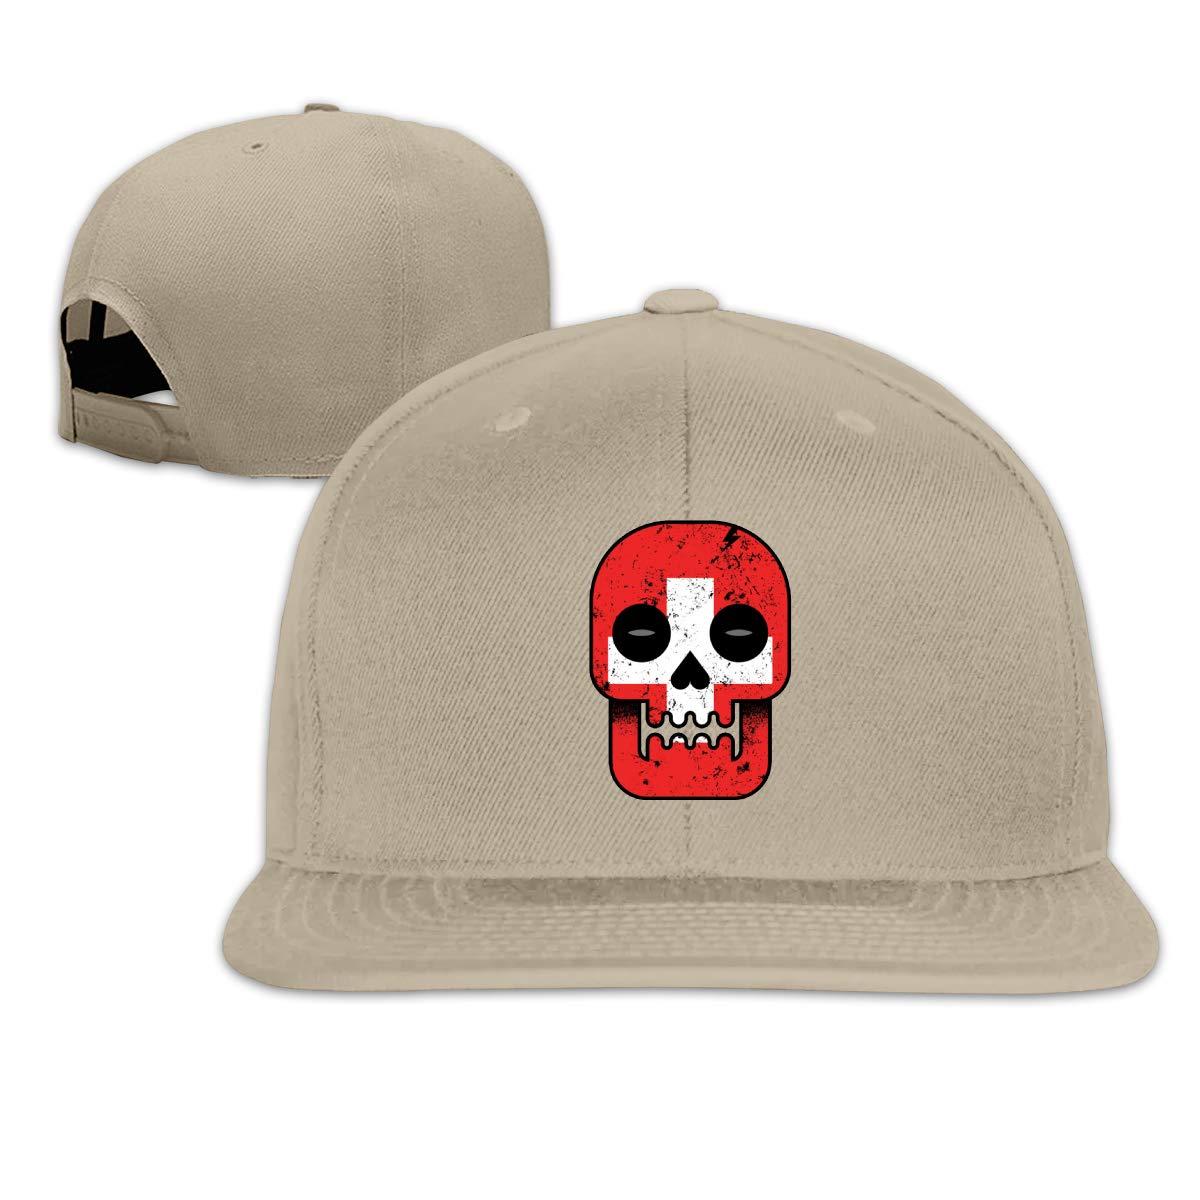 Switzerland Till I Die Unisex Adult Hats Classic Baseball Caps Sports Hat Peaked Cap